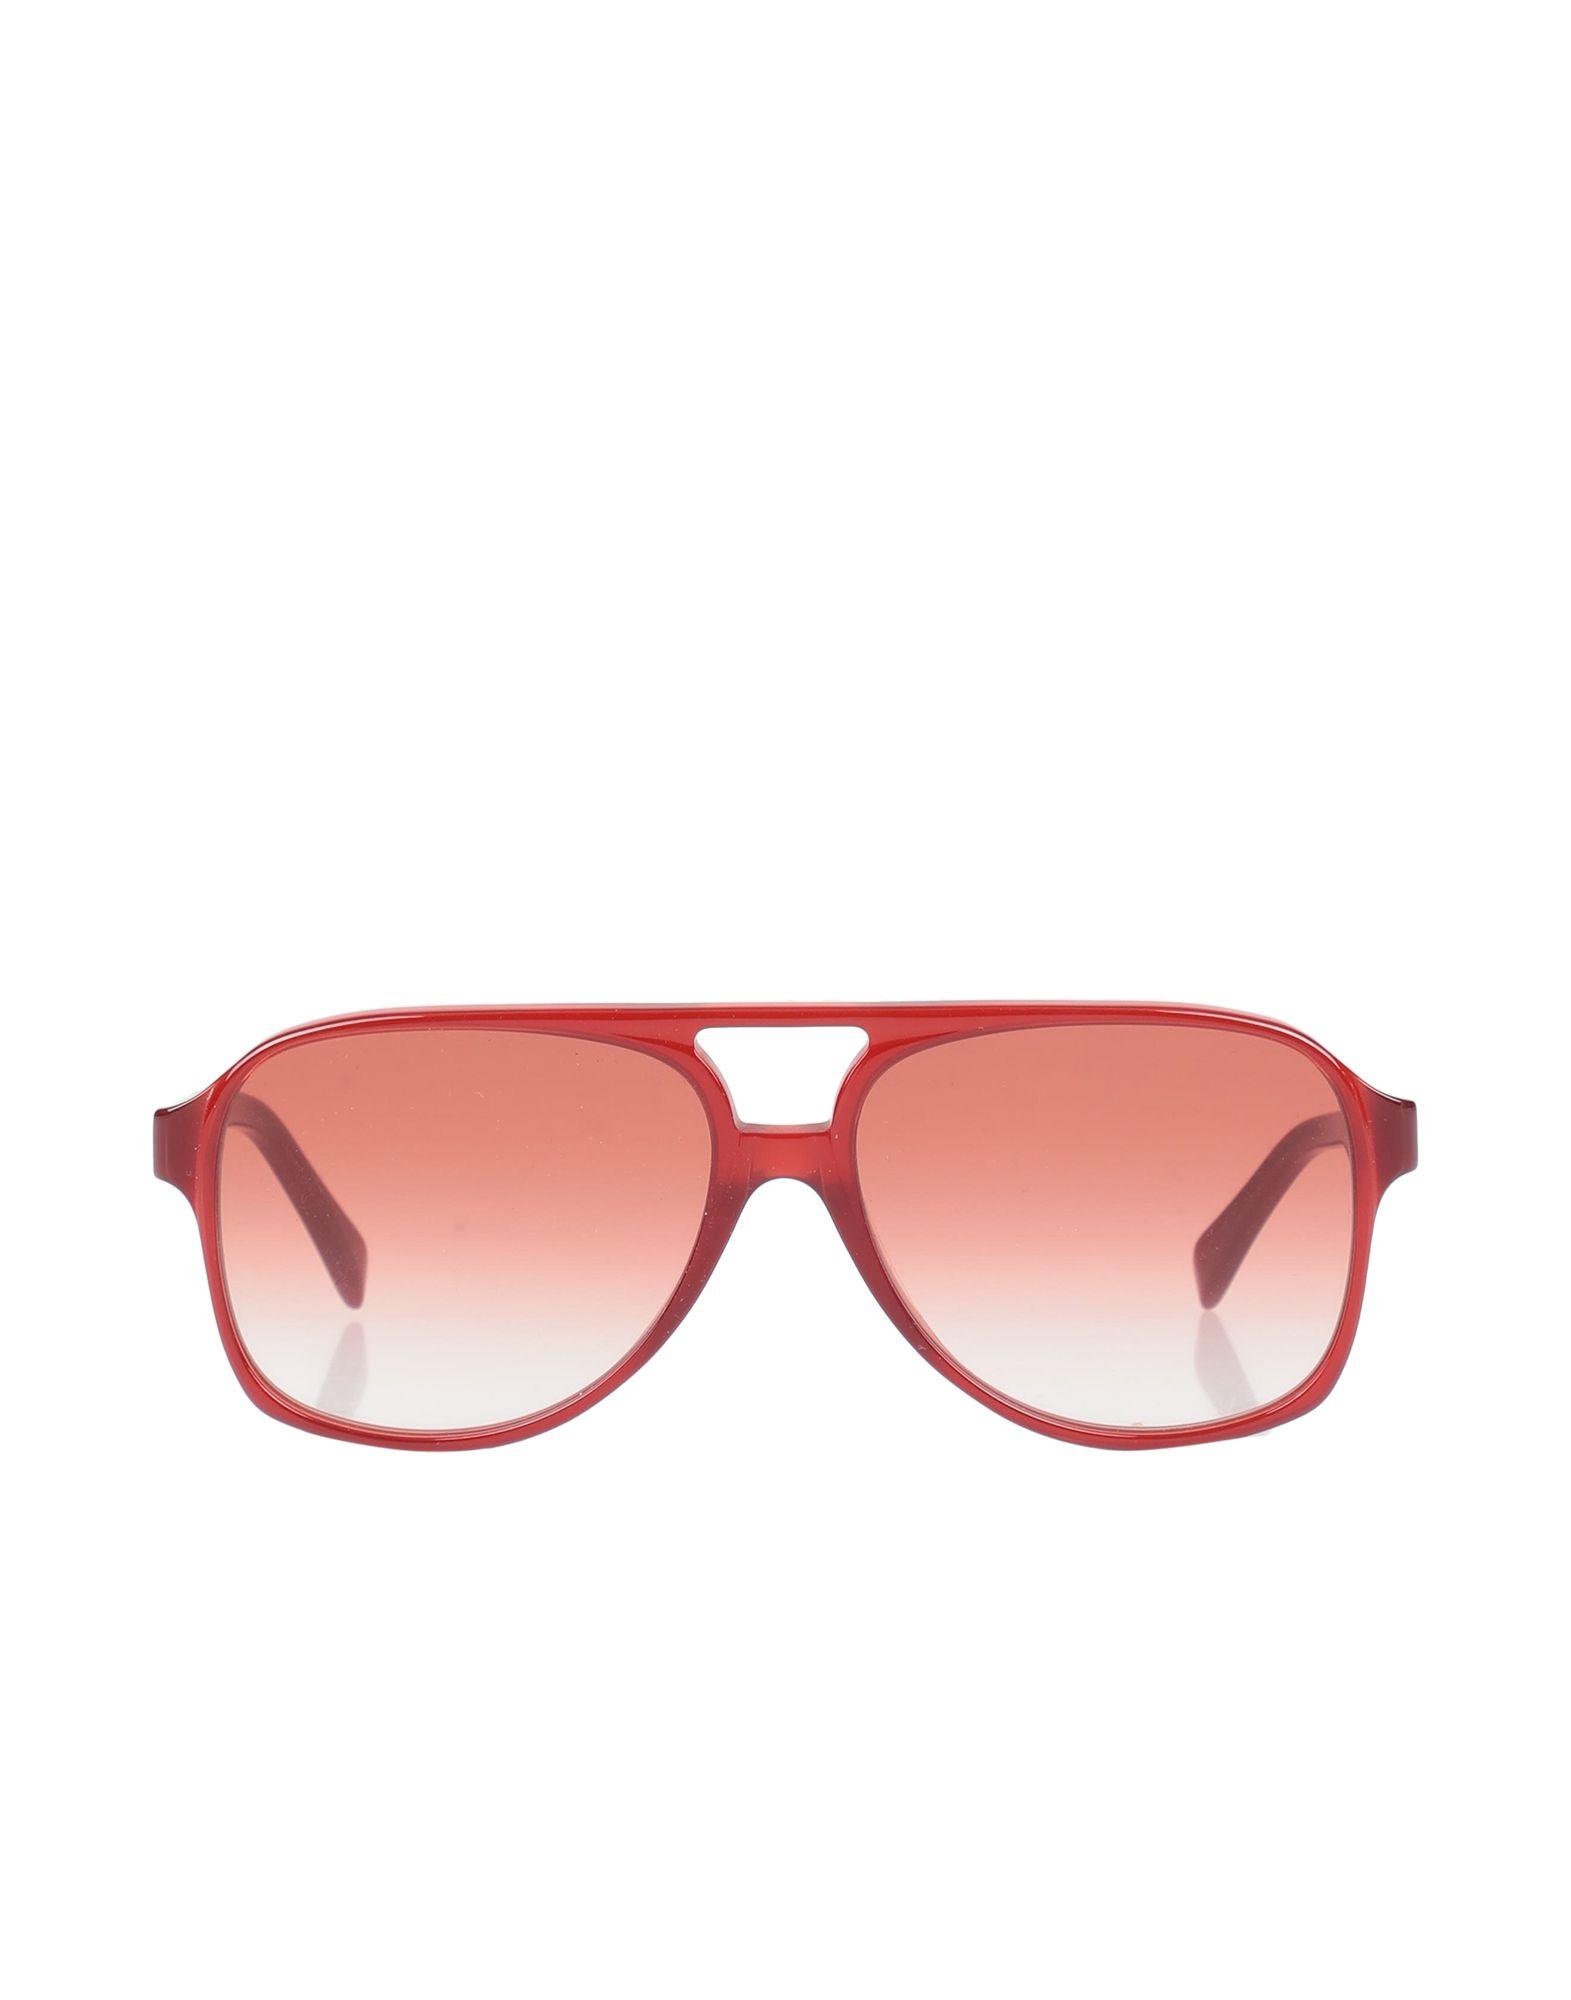 CELINE Солнечные очки for art s sake солнечные очки